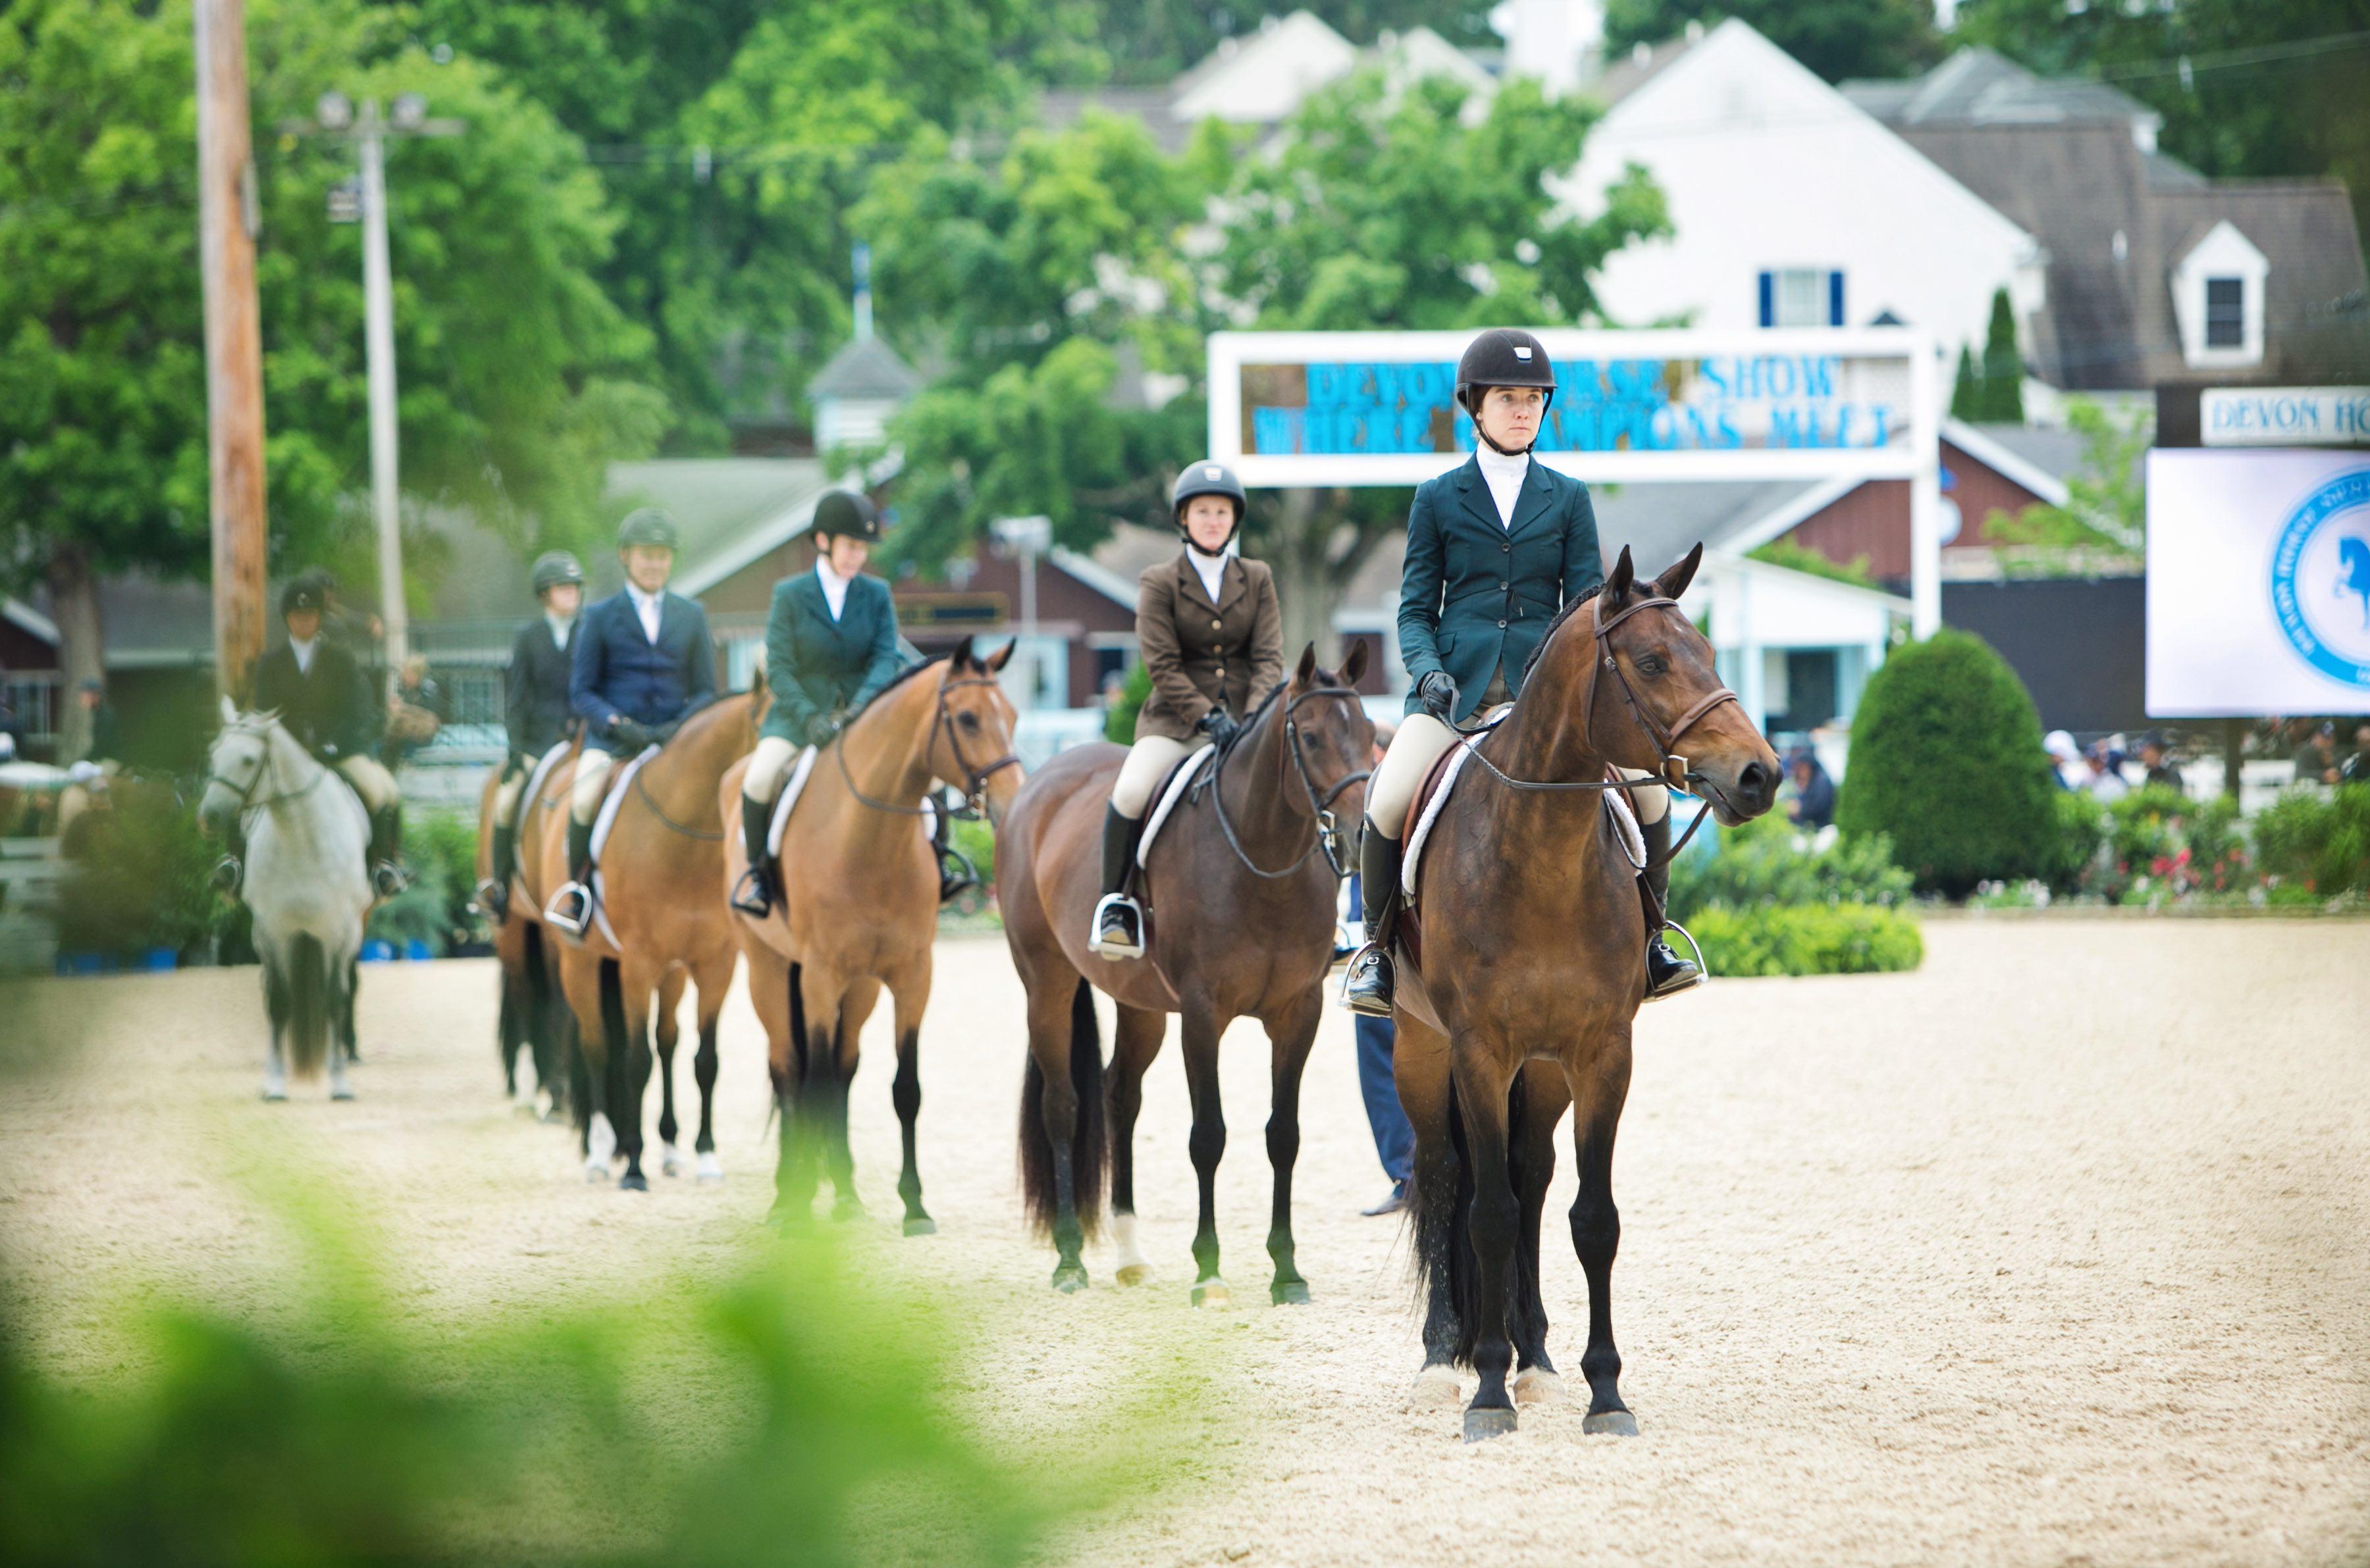 devon-horse-show-country-fair-exhibitors